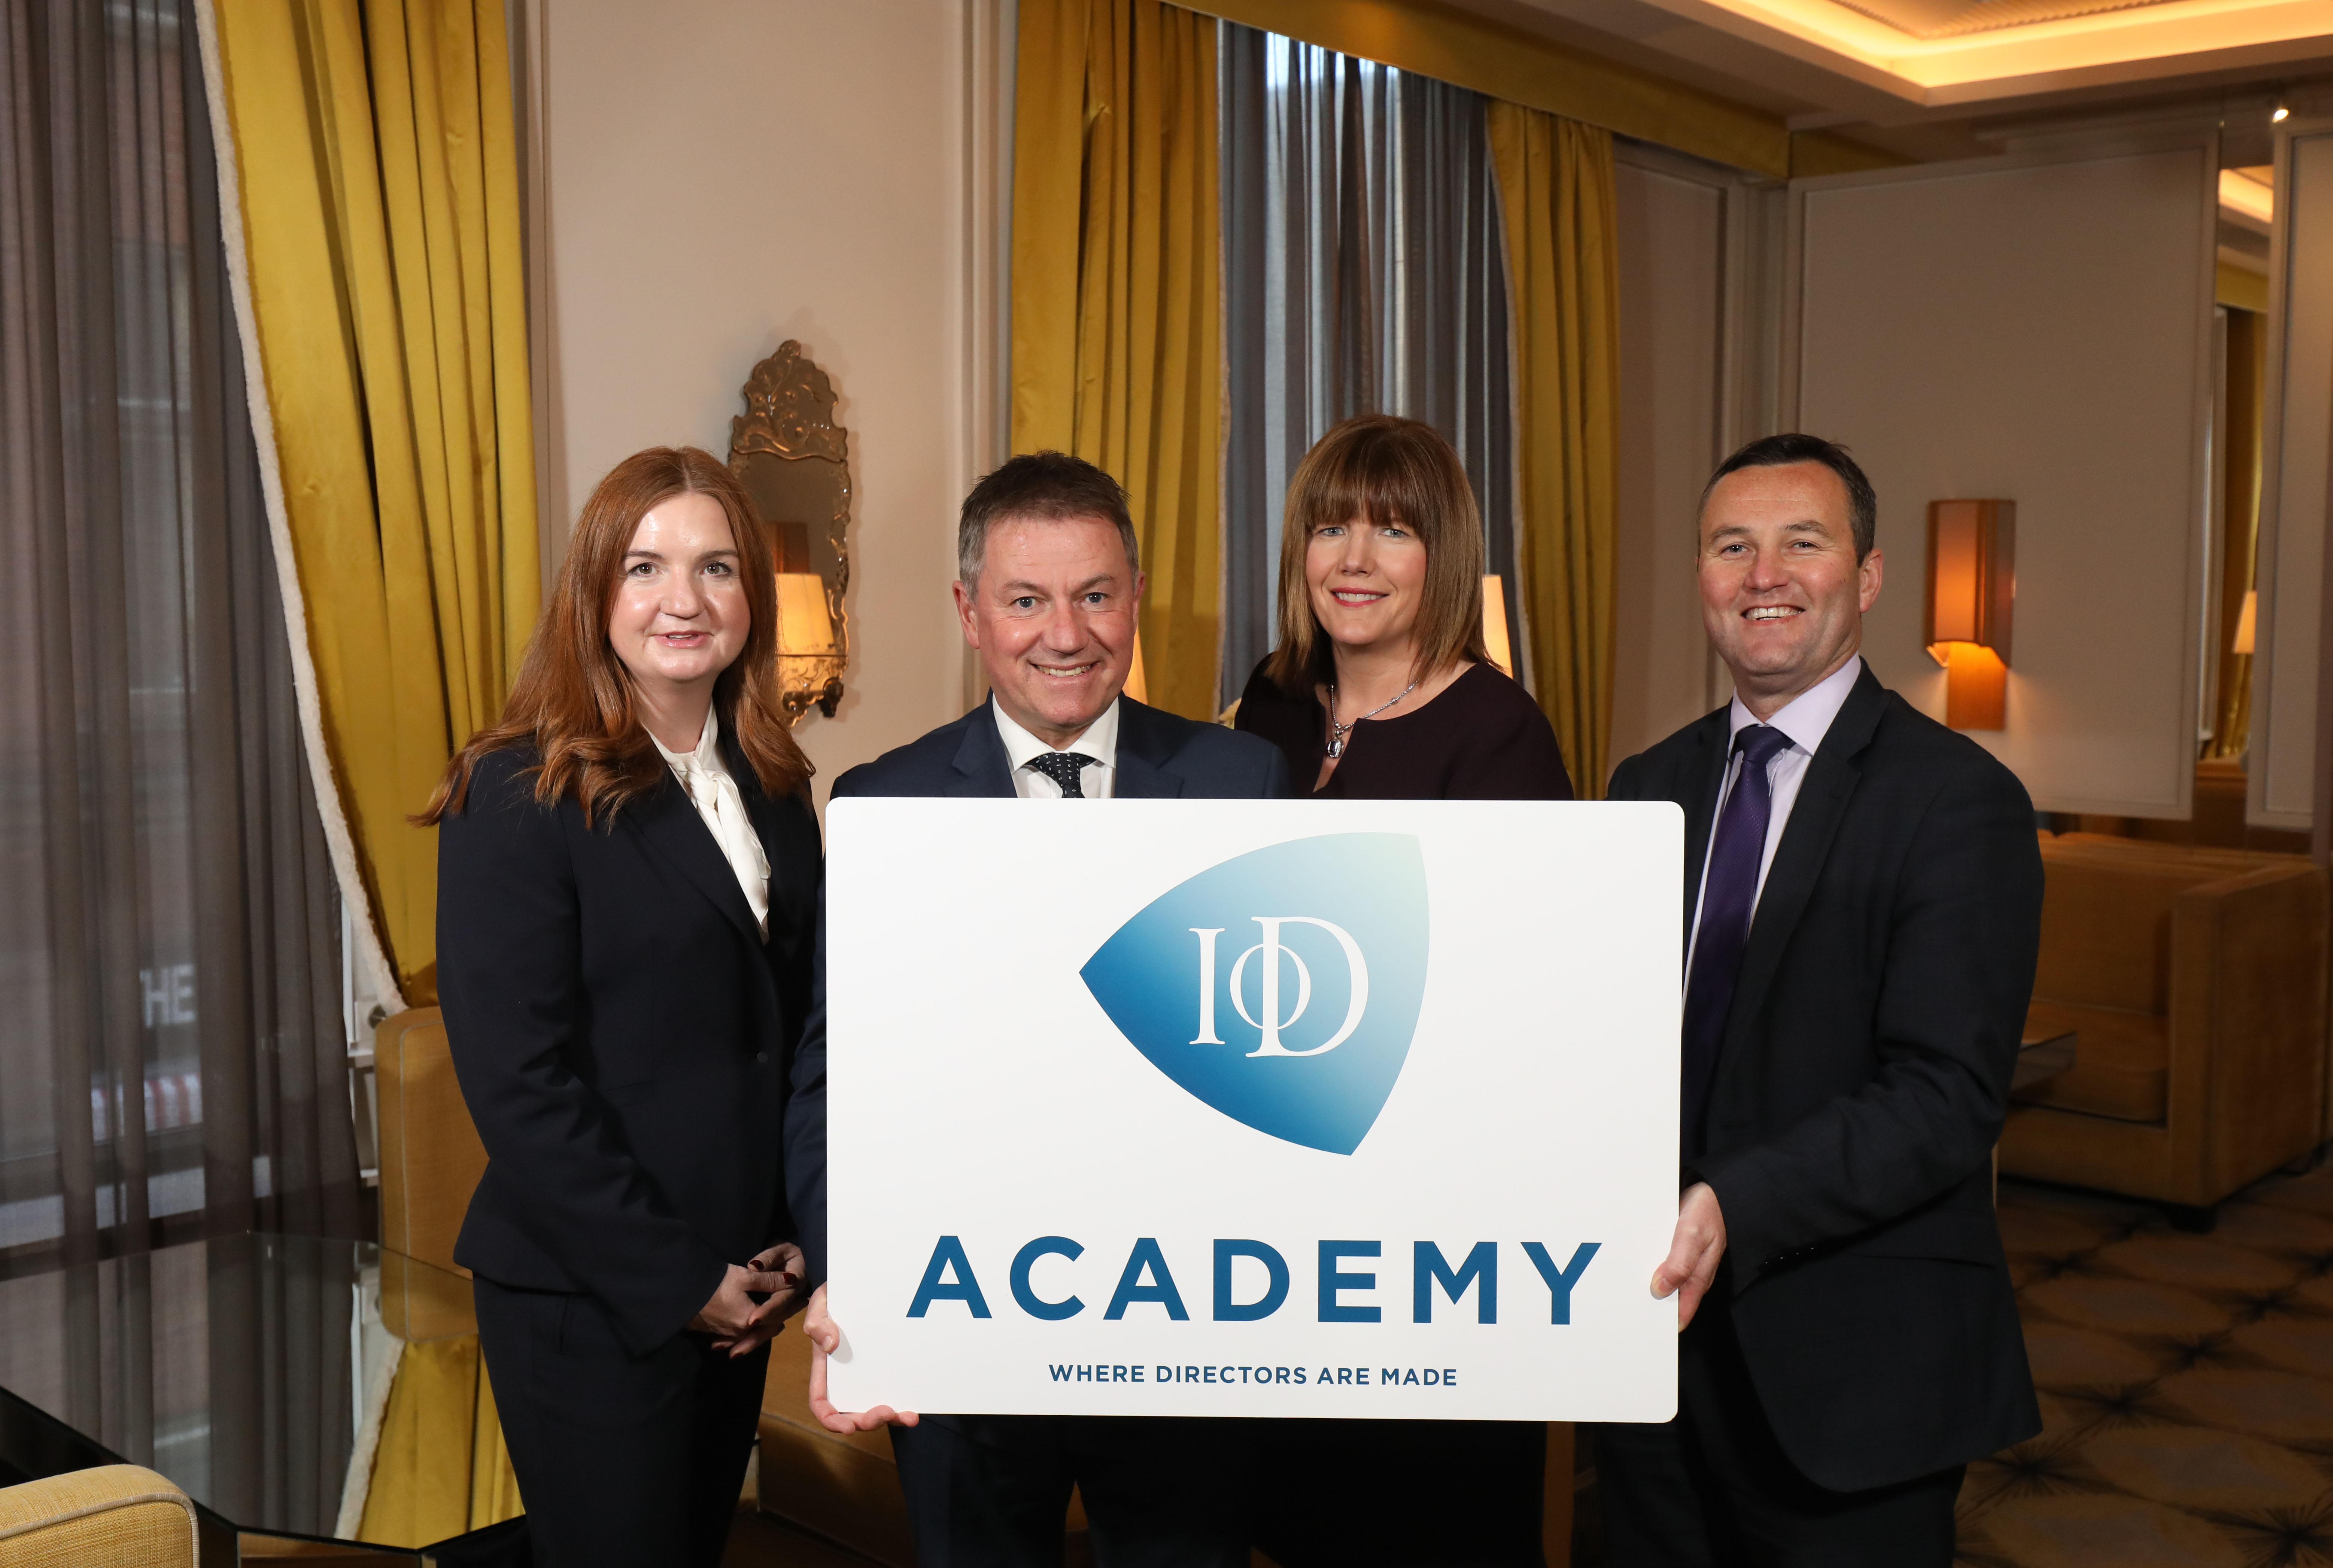 IoD Academy 2020 launch